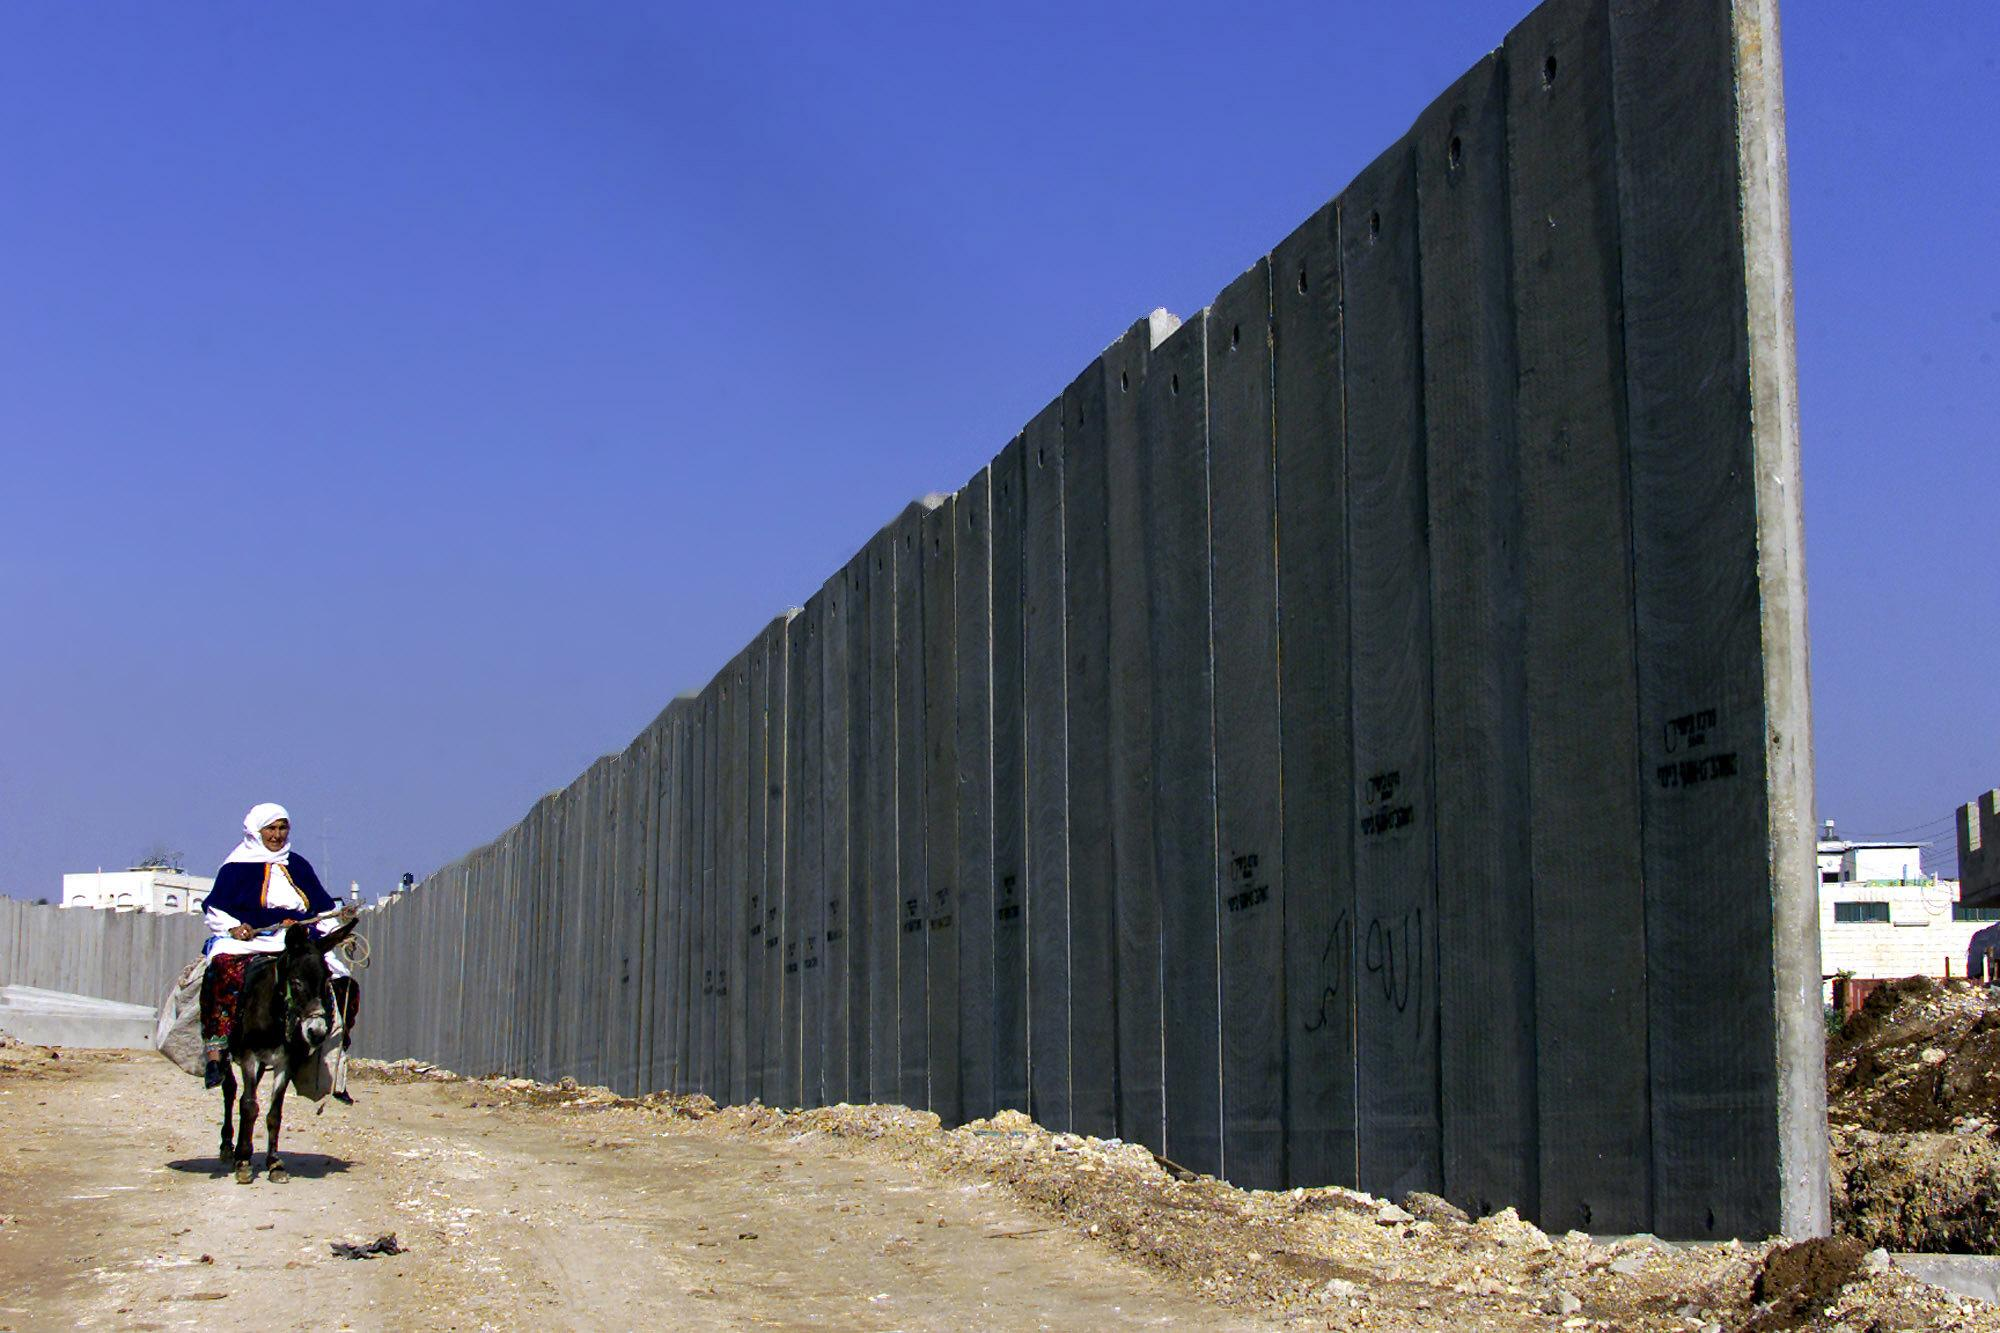 Lideri palestinieni: Sharon a fost